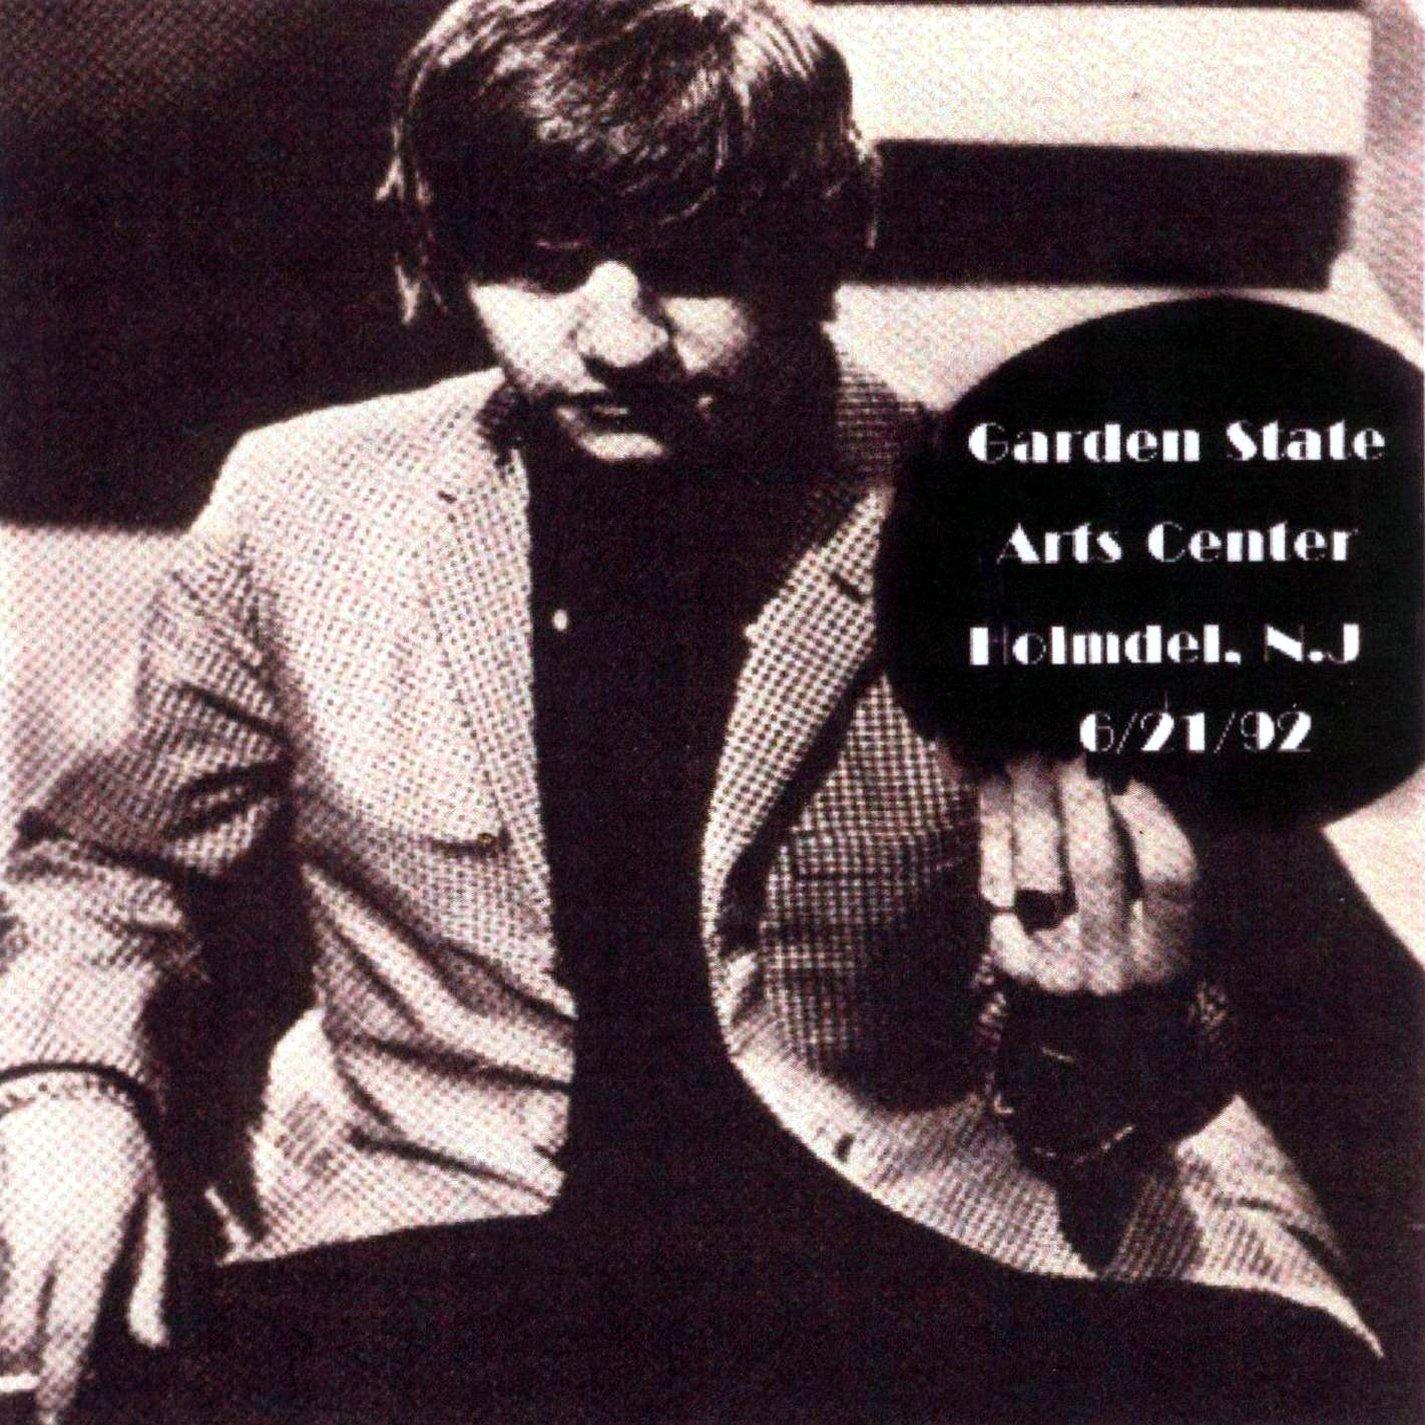 Losslegs Lossless Bootlegs Ringo Starr Garden State